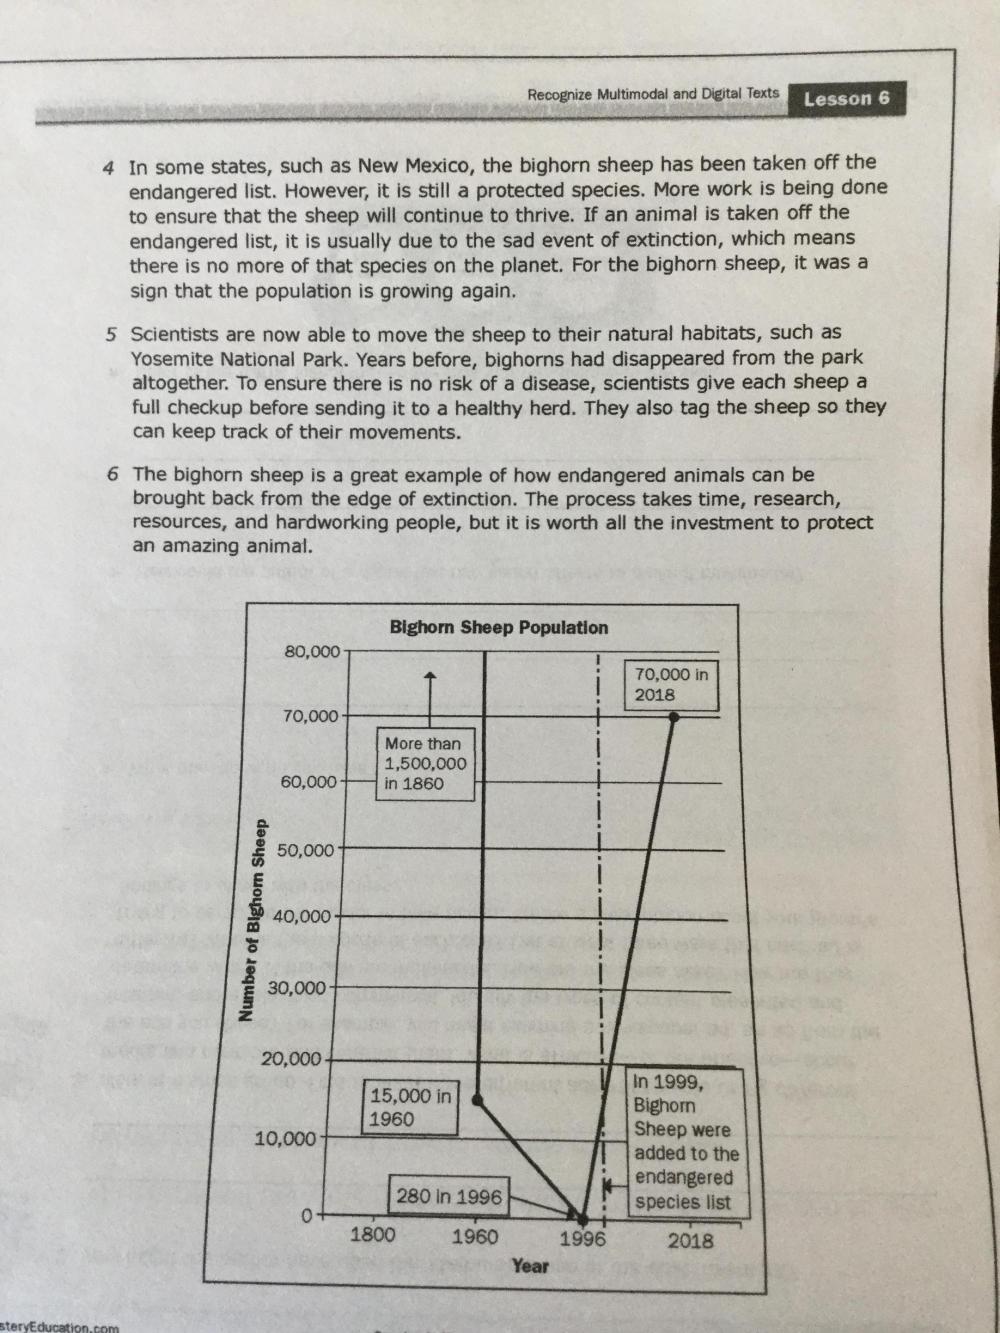 medium resolution of Houston Gateway Academy